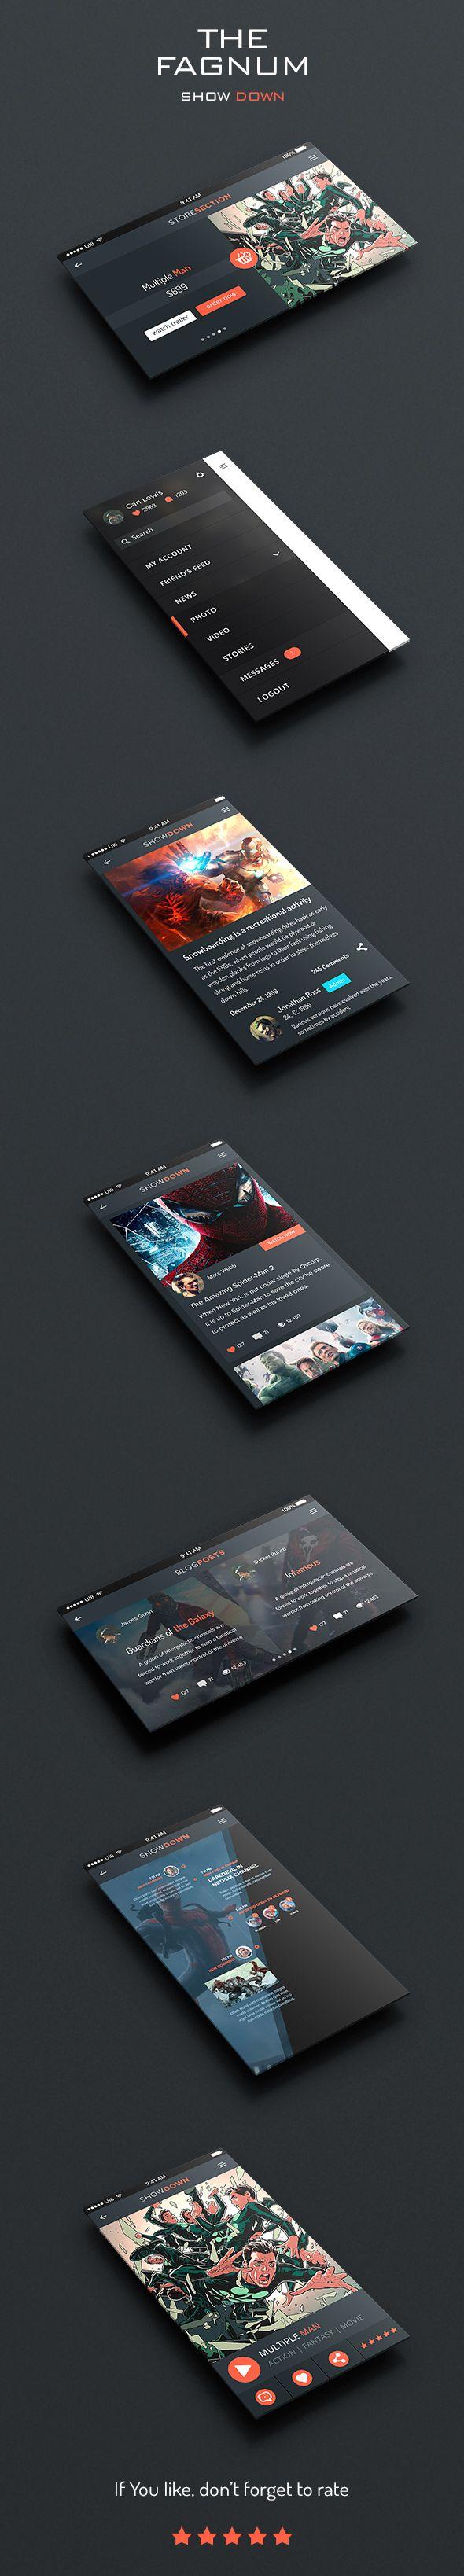 ShowDown UI on Behance